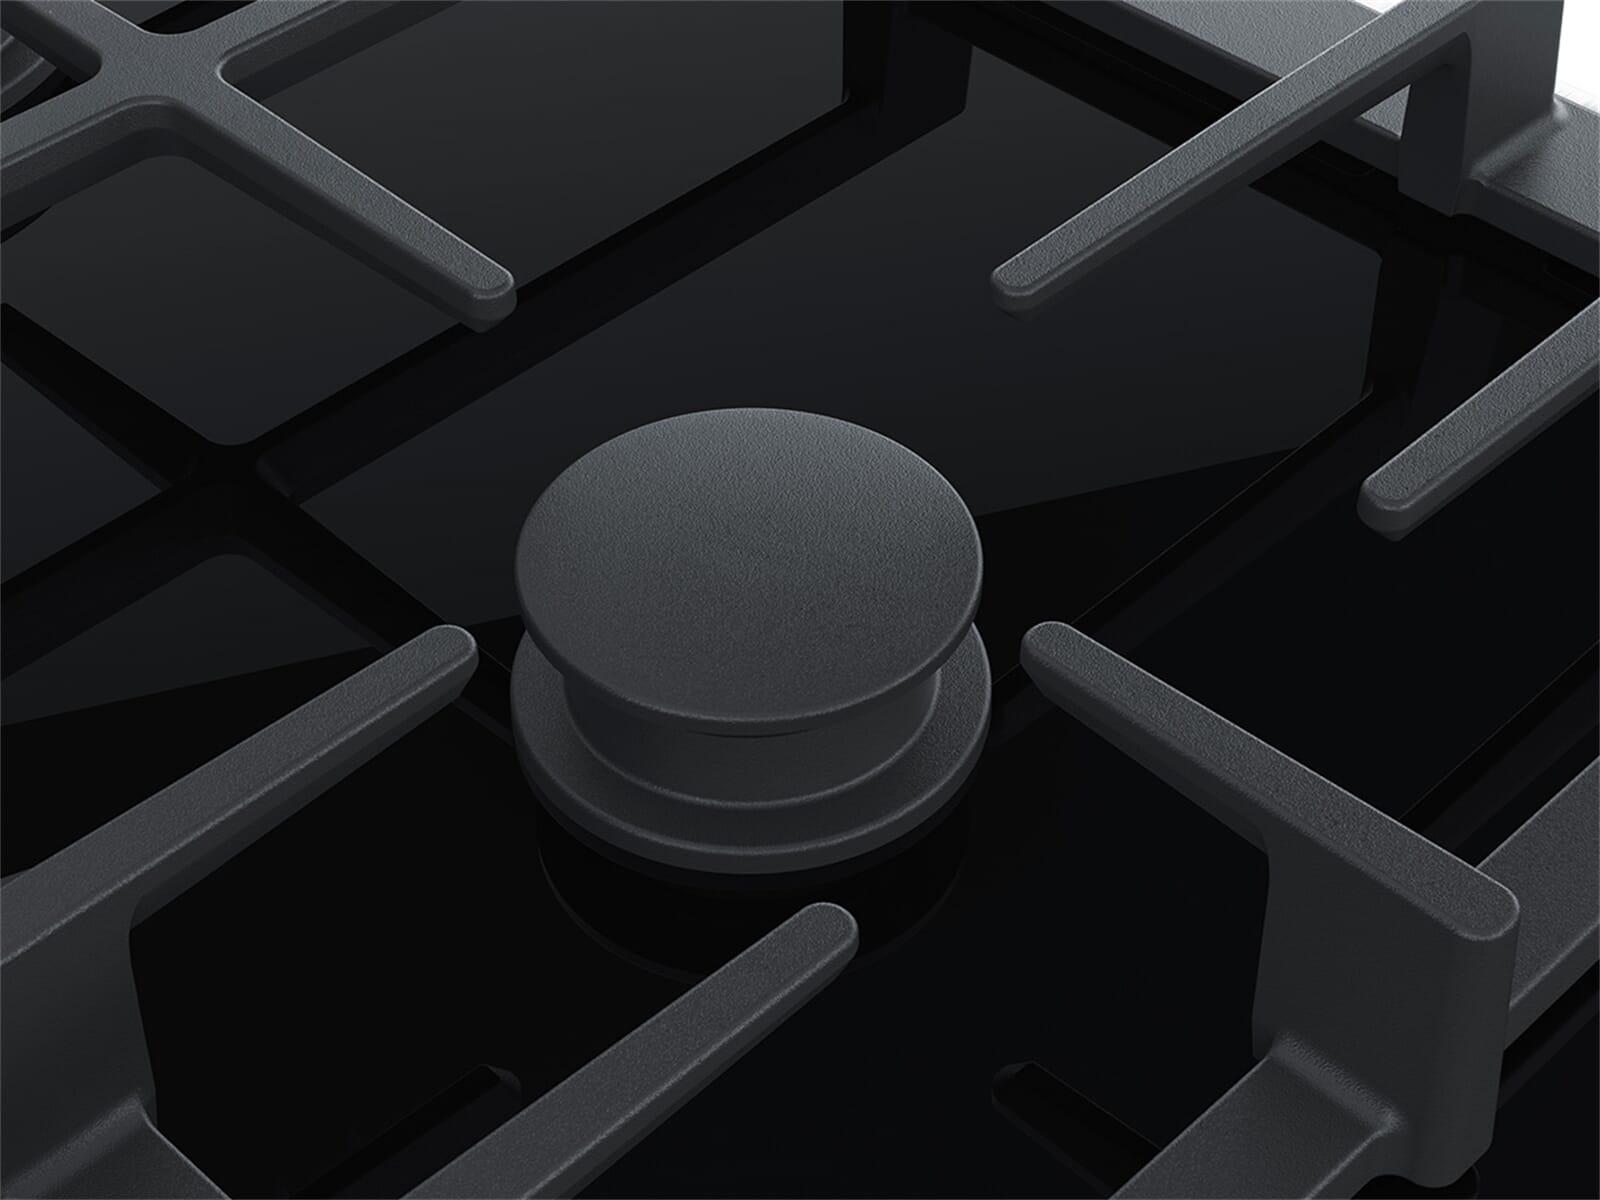 bosch prr7a6d70d glaskeramik gaskochfeld autark. Black Bedroom Furniture Sets. Home Design Ideas